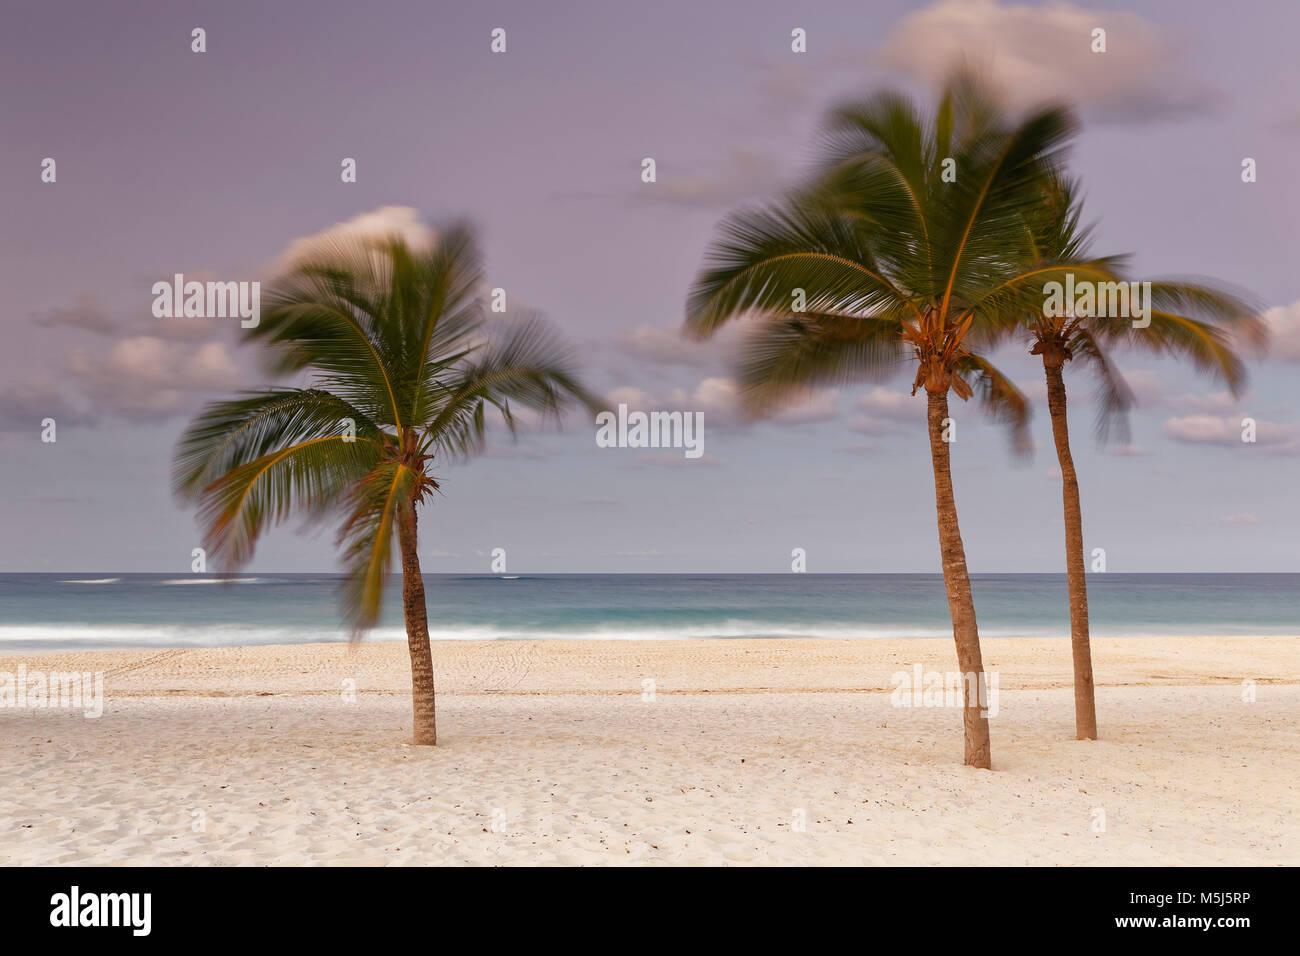 Karibik, Dominikanische Republik, Punta Cana, Playa Bavaro, bewegte Palmen am Strand bei Sonnenuntergang Stockbild